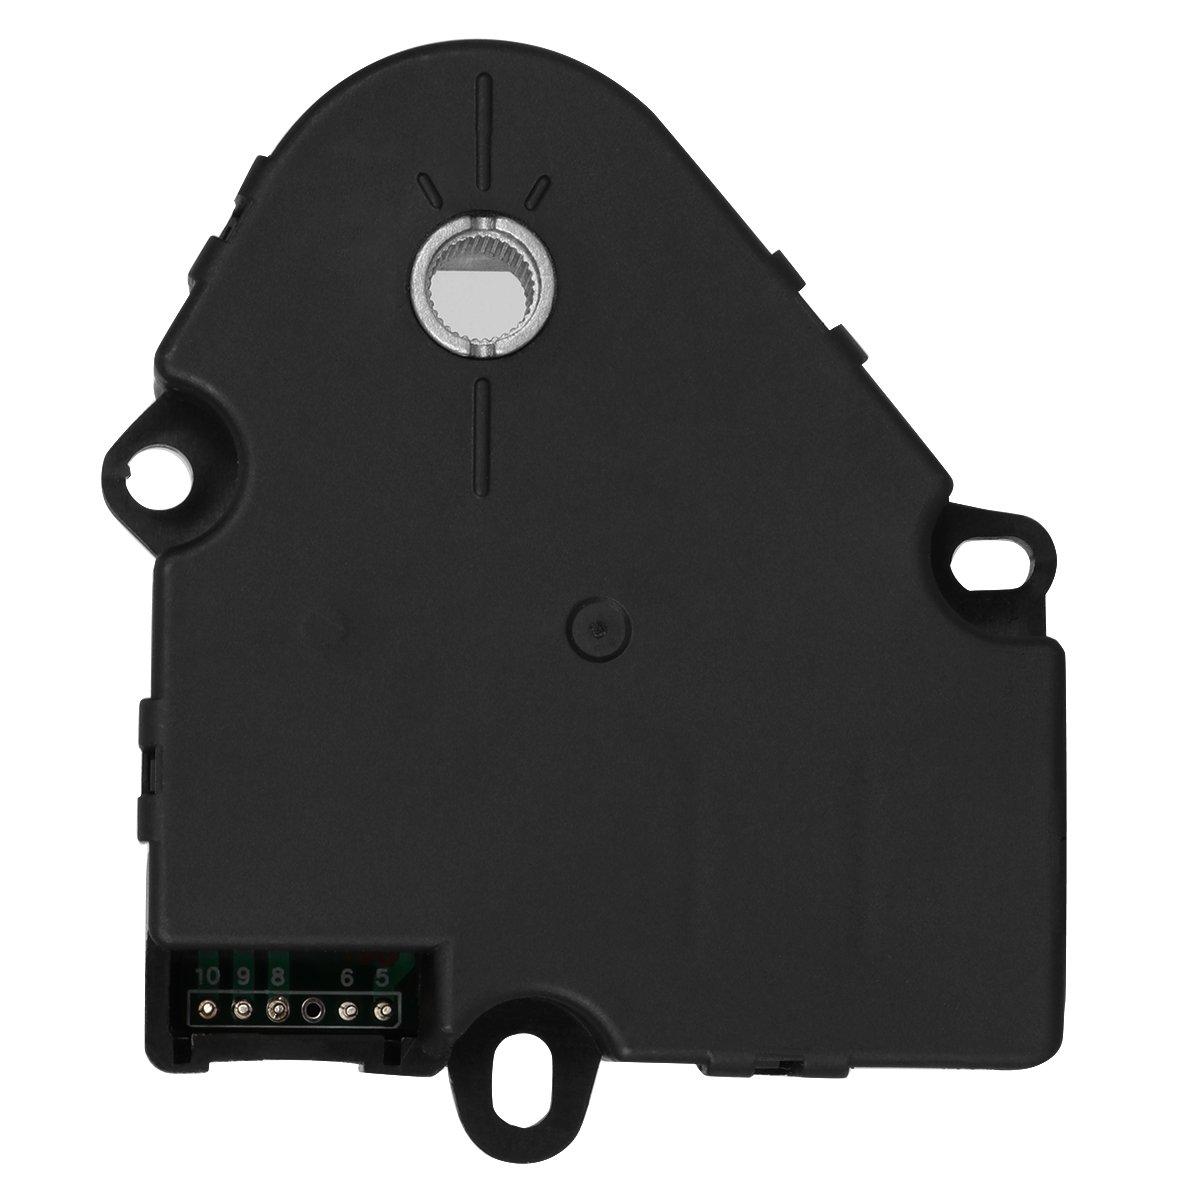 Hvac Blend Door Actuator For 2008 2012 Chevy Malibu Nissan Armada Heater 2005 2010 Pontiac G6 2007 2009 Saturn Aura Replaces 604 135 15844209